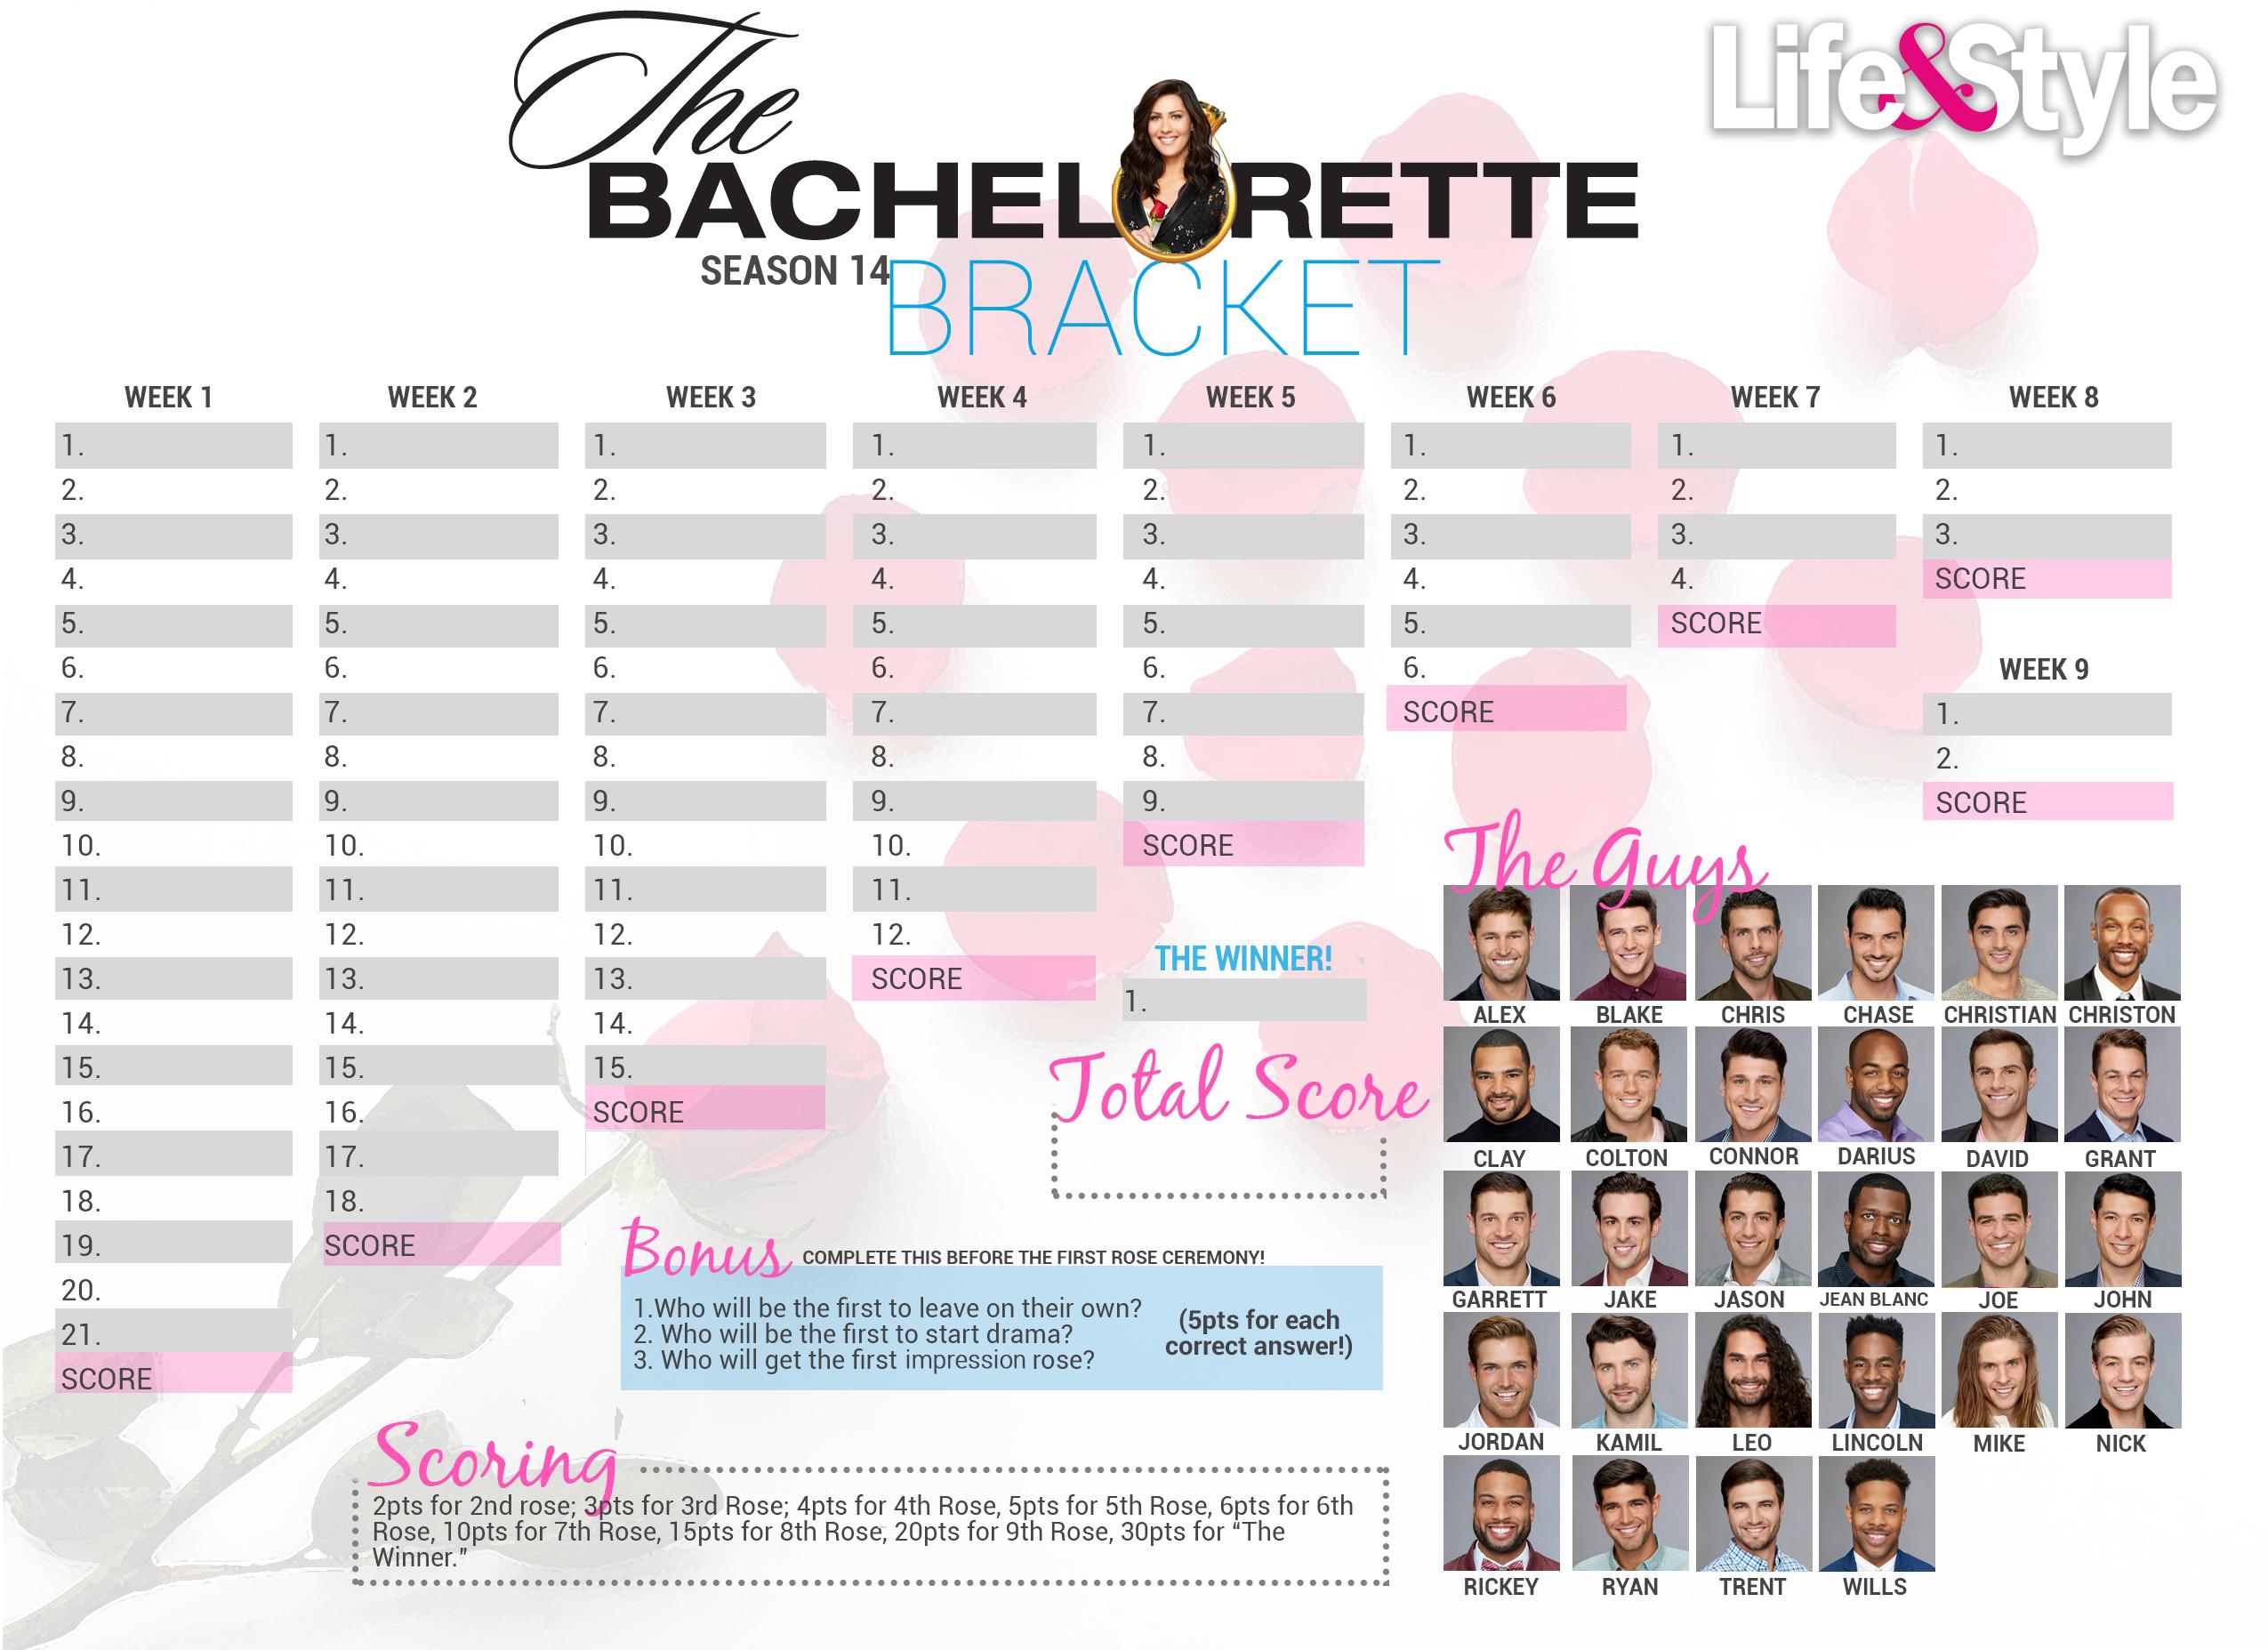 photo about Bachelorette Bracket Printable identify Bachelorette Bracket 2018 Down load, Print Prior to the Premiere